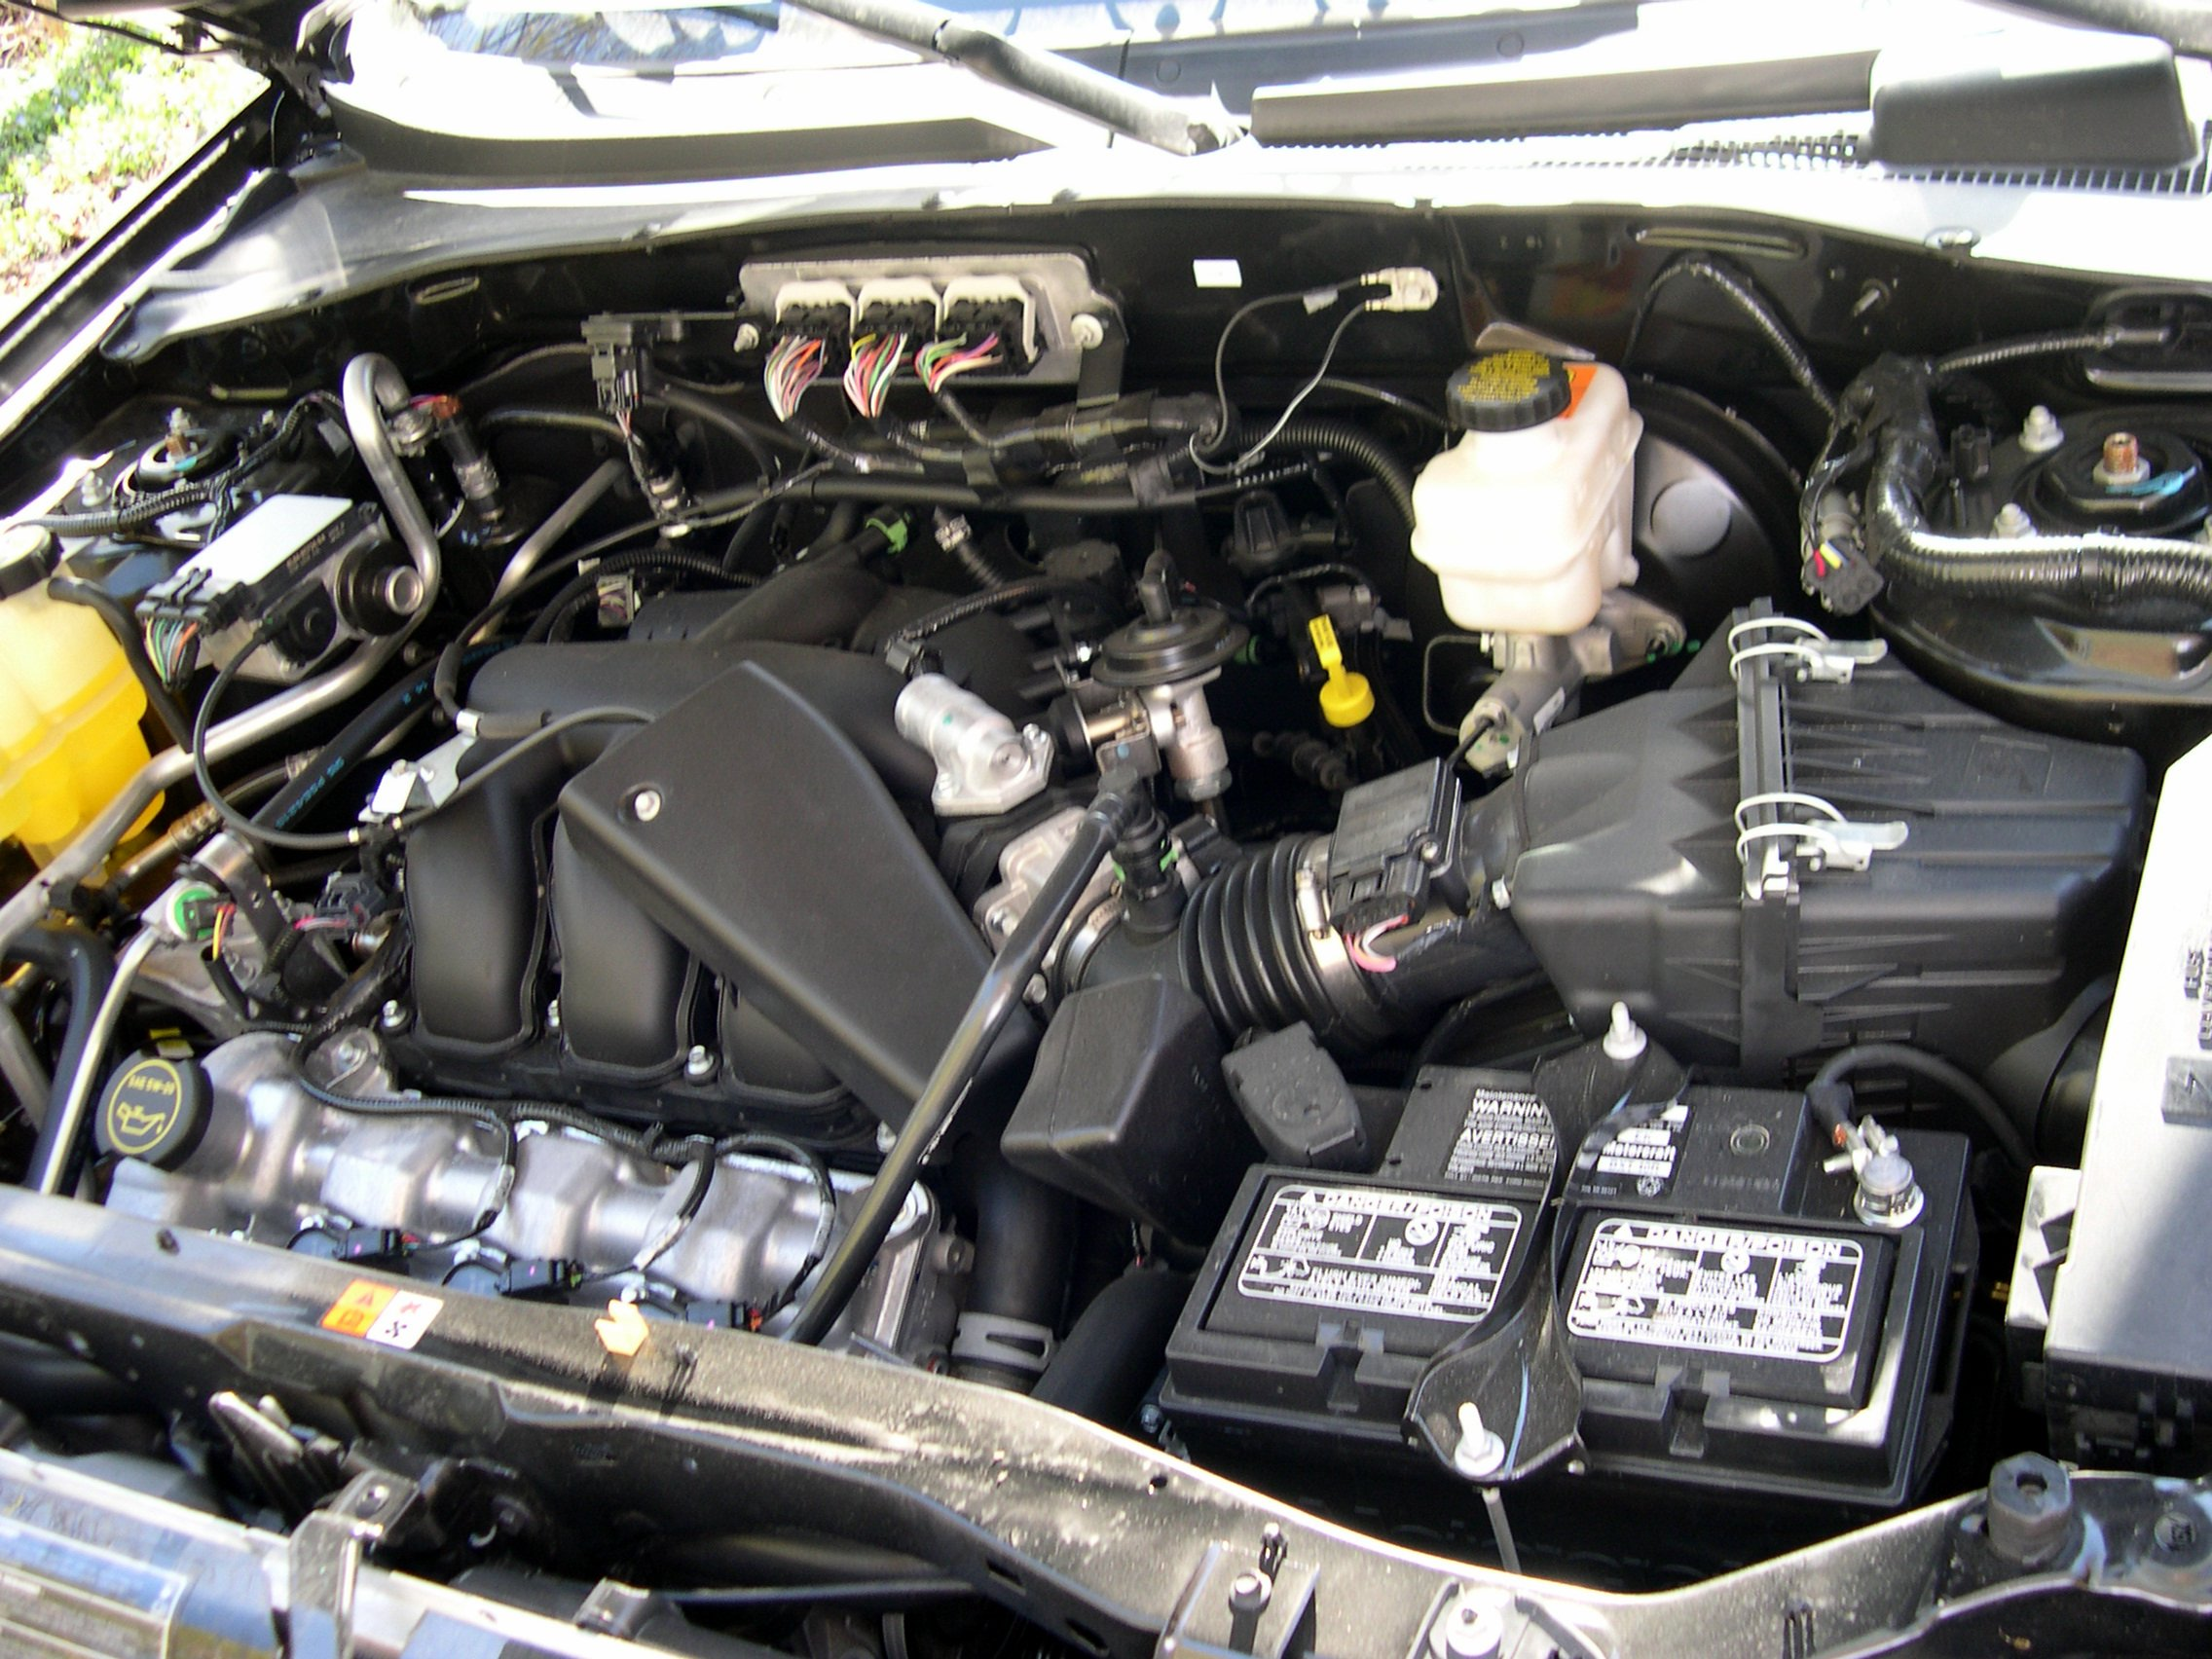 2006 Ford Escape Engine Diagram Ford Auto Parts Catalog